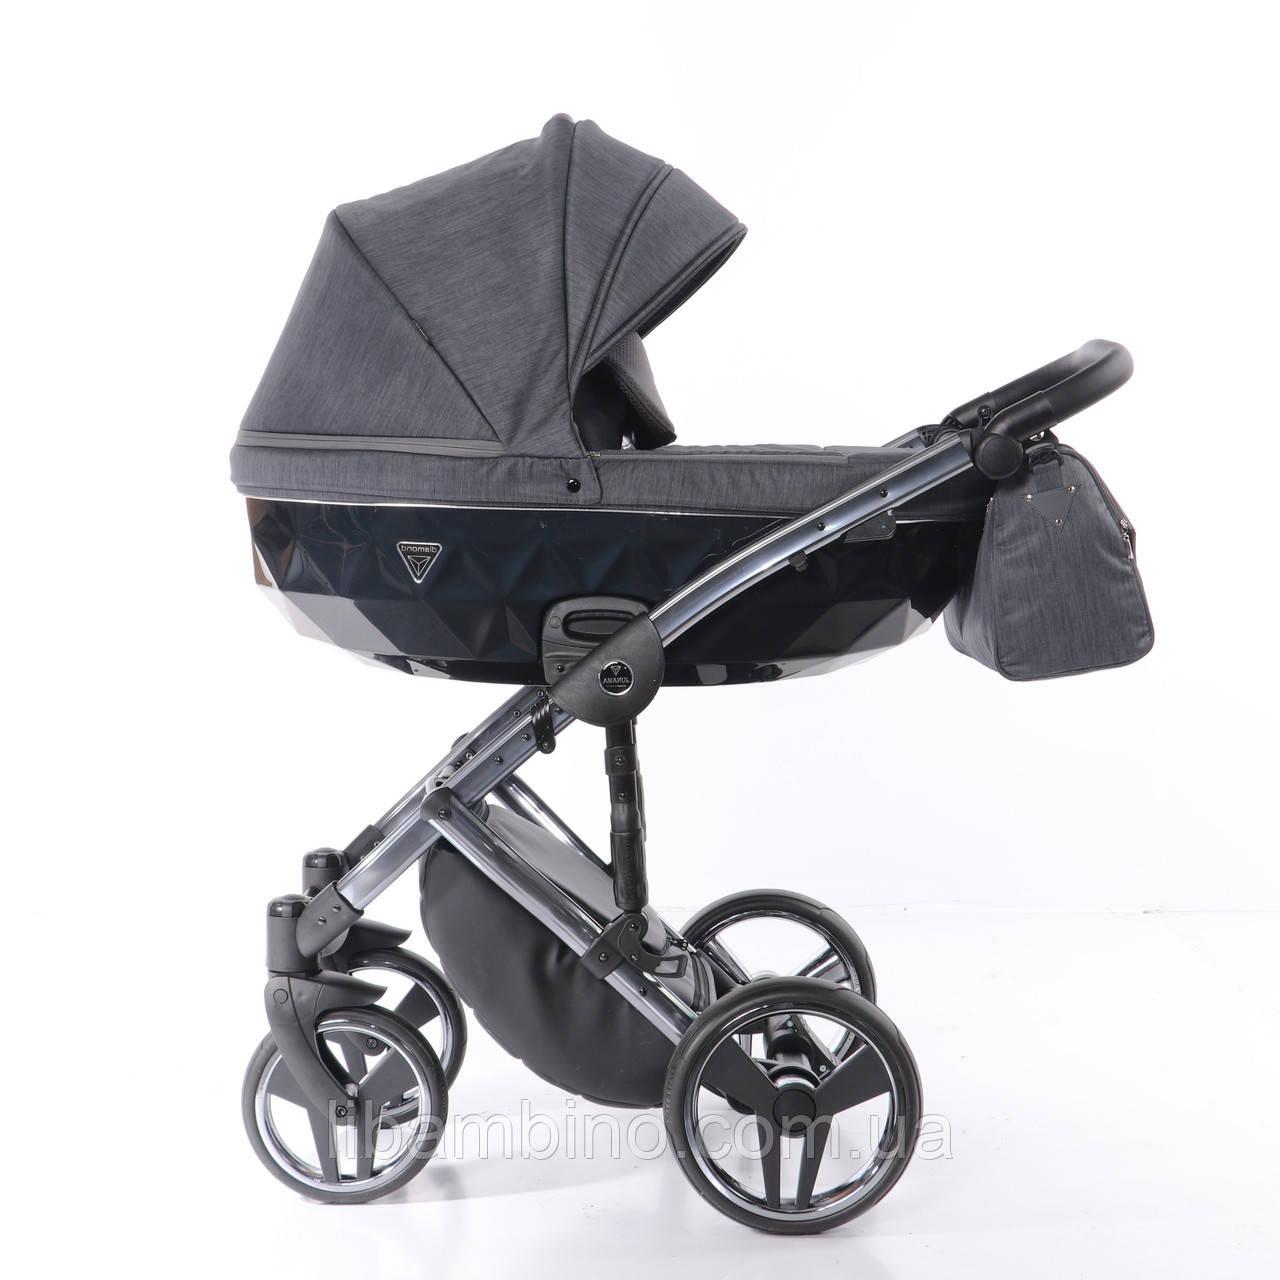 Дитяча універсальна коляска 2 в 1 Junama Saphire 02